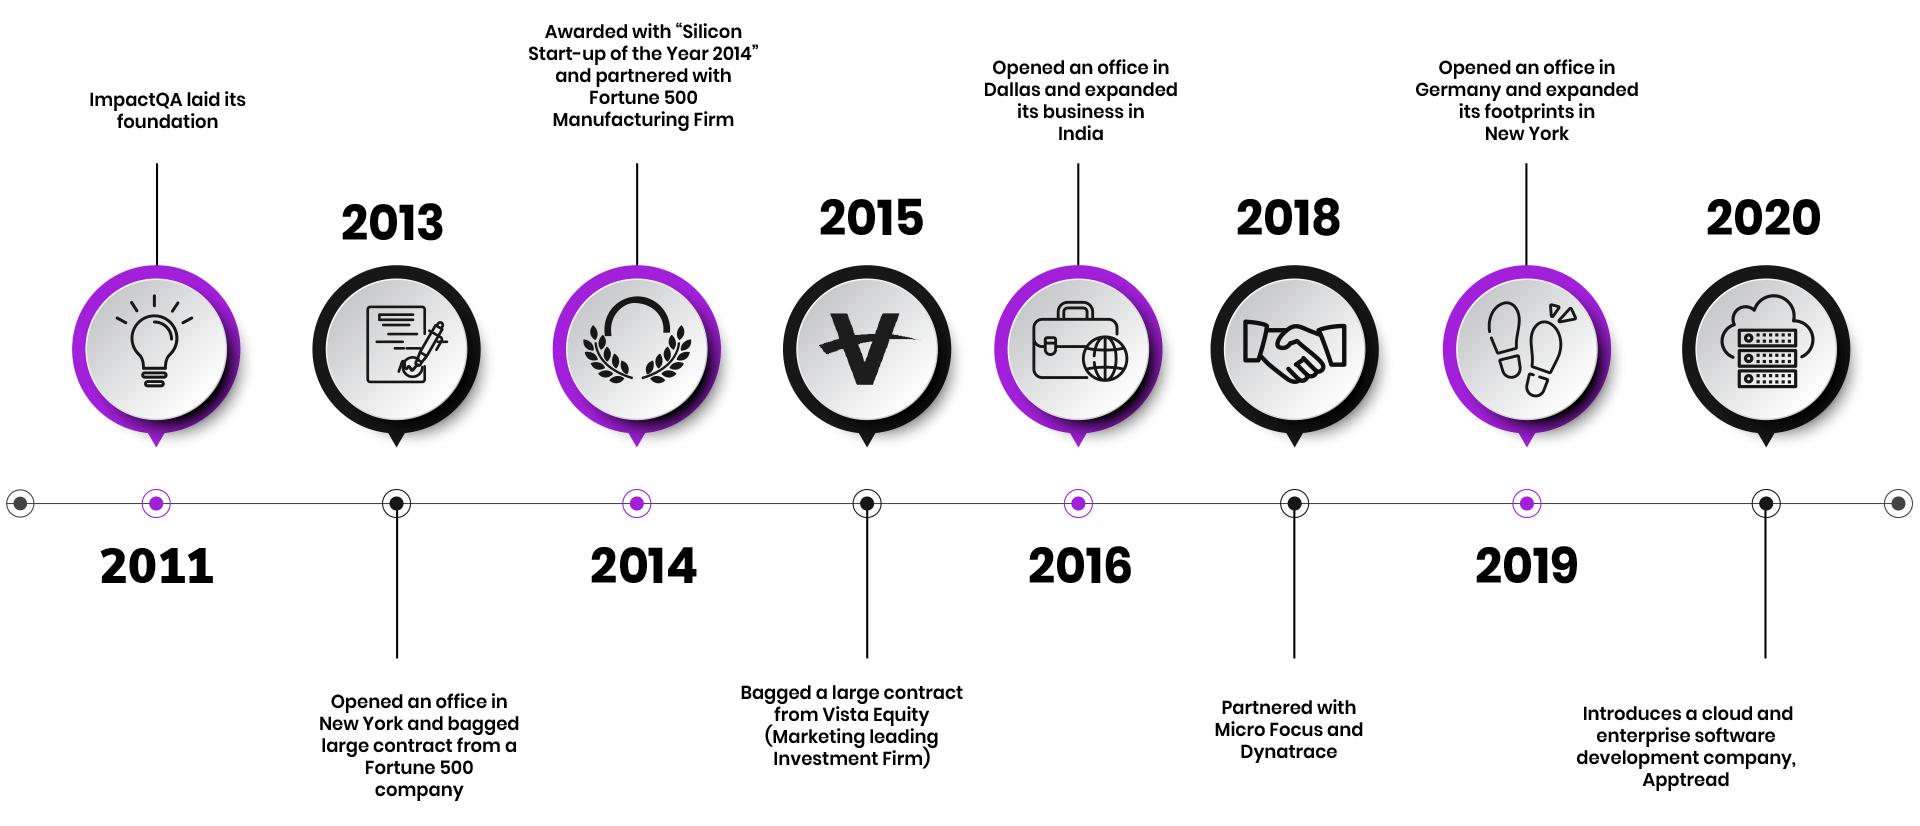 ImpactQA Roadmap